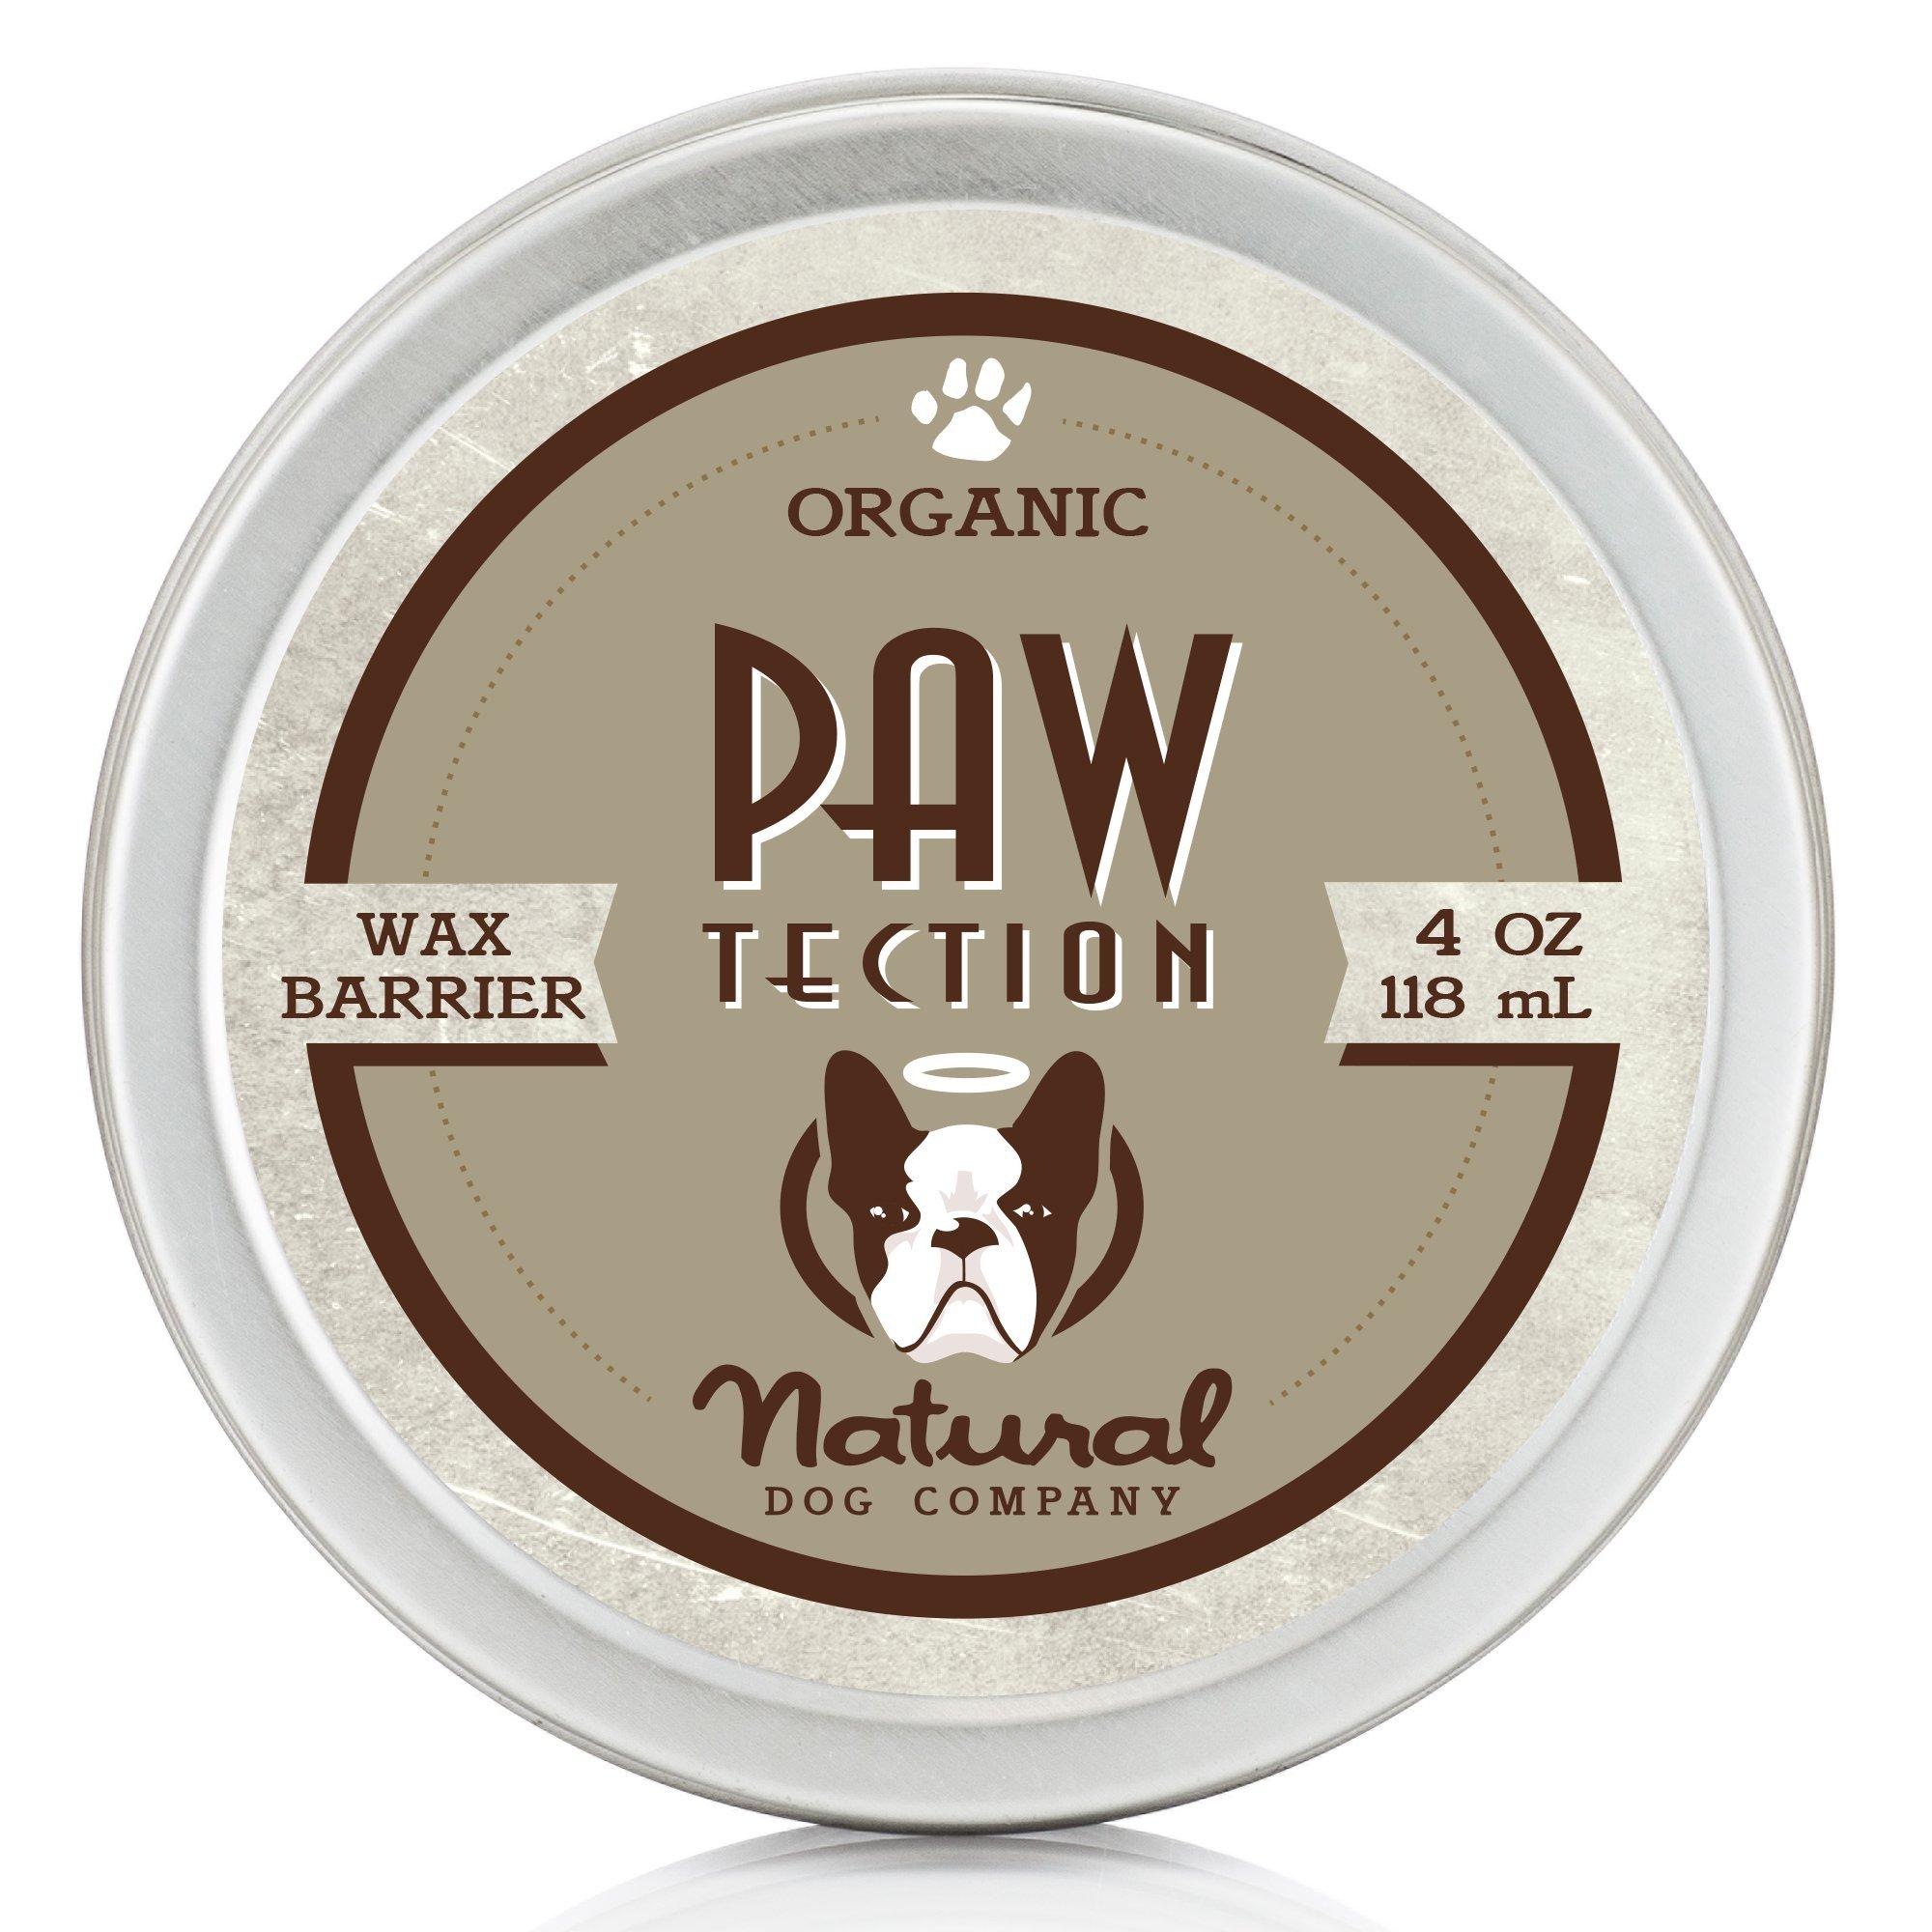 NaturalDog.com PAWTECTION | Organic, All Natural | For Protecting Paw Pads | 4 oz Tin